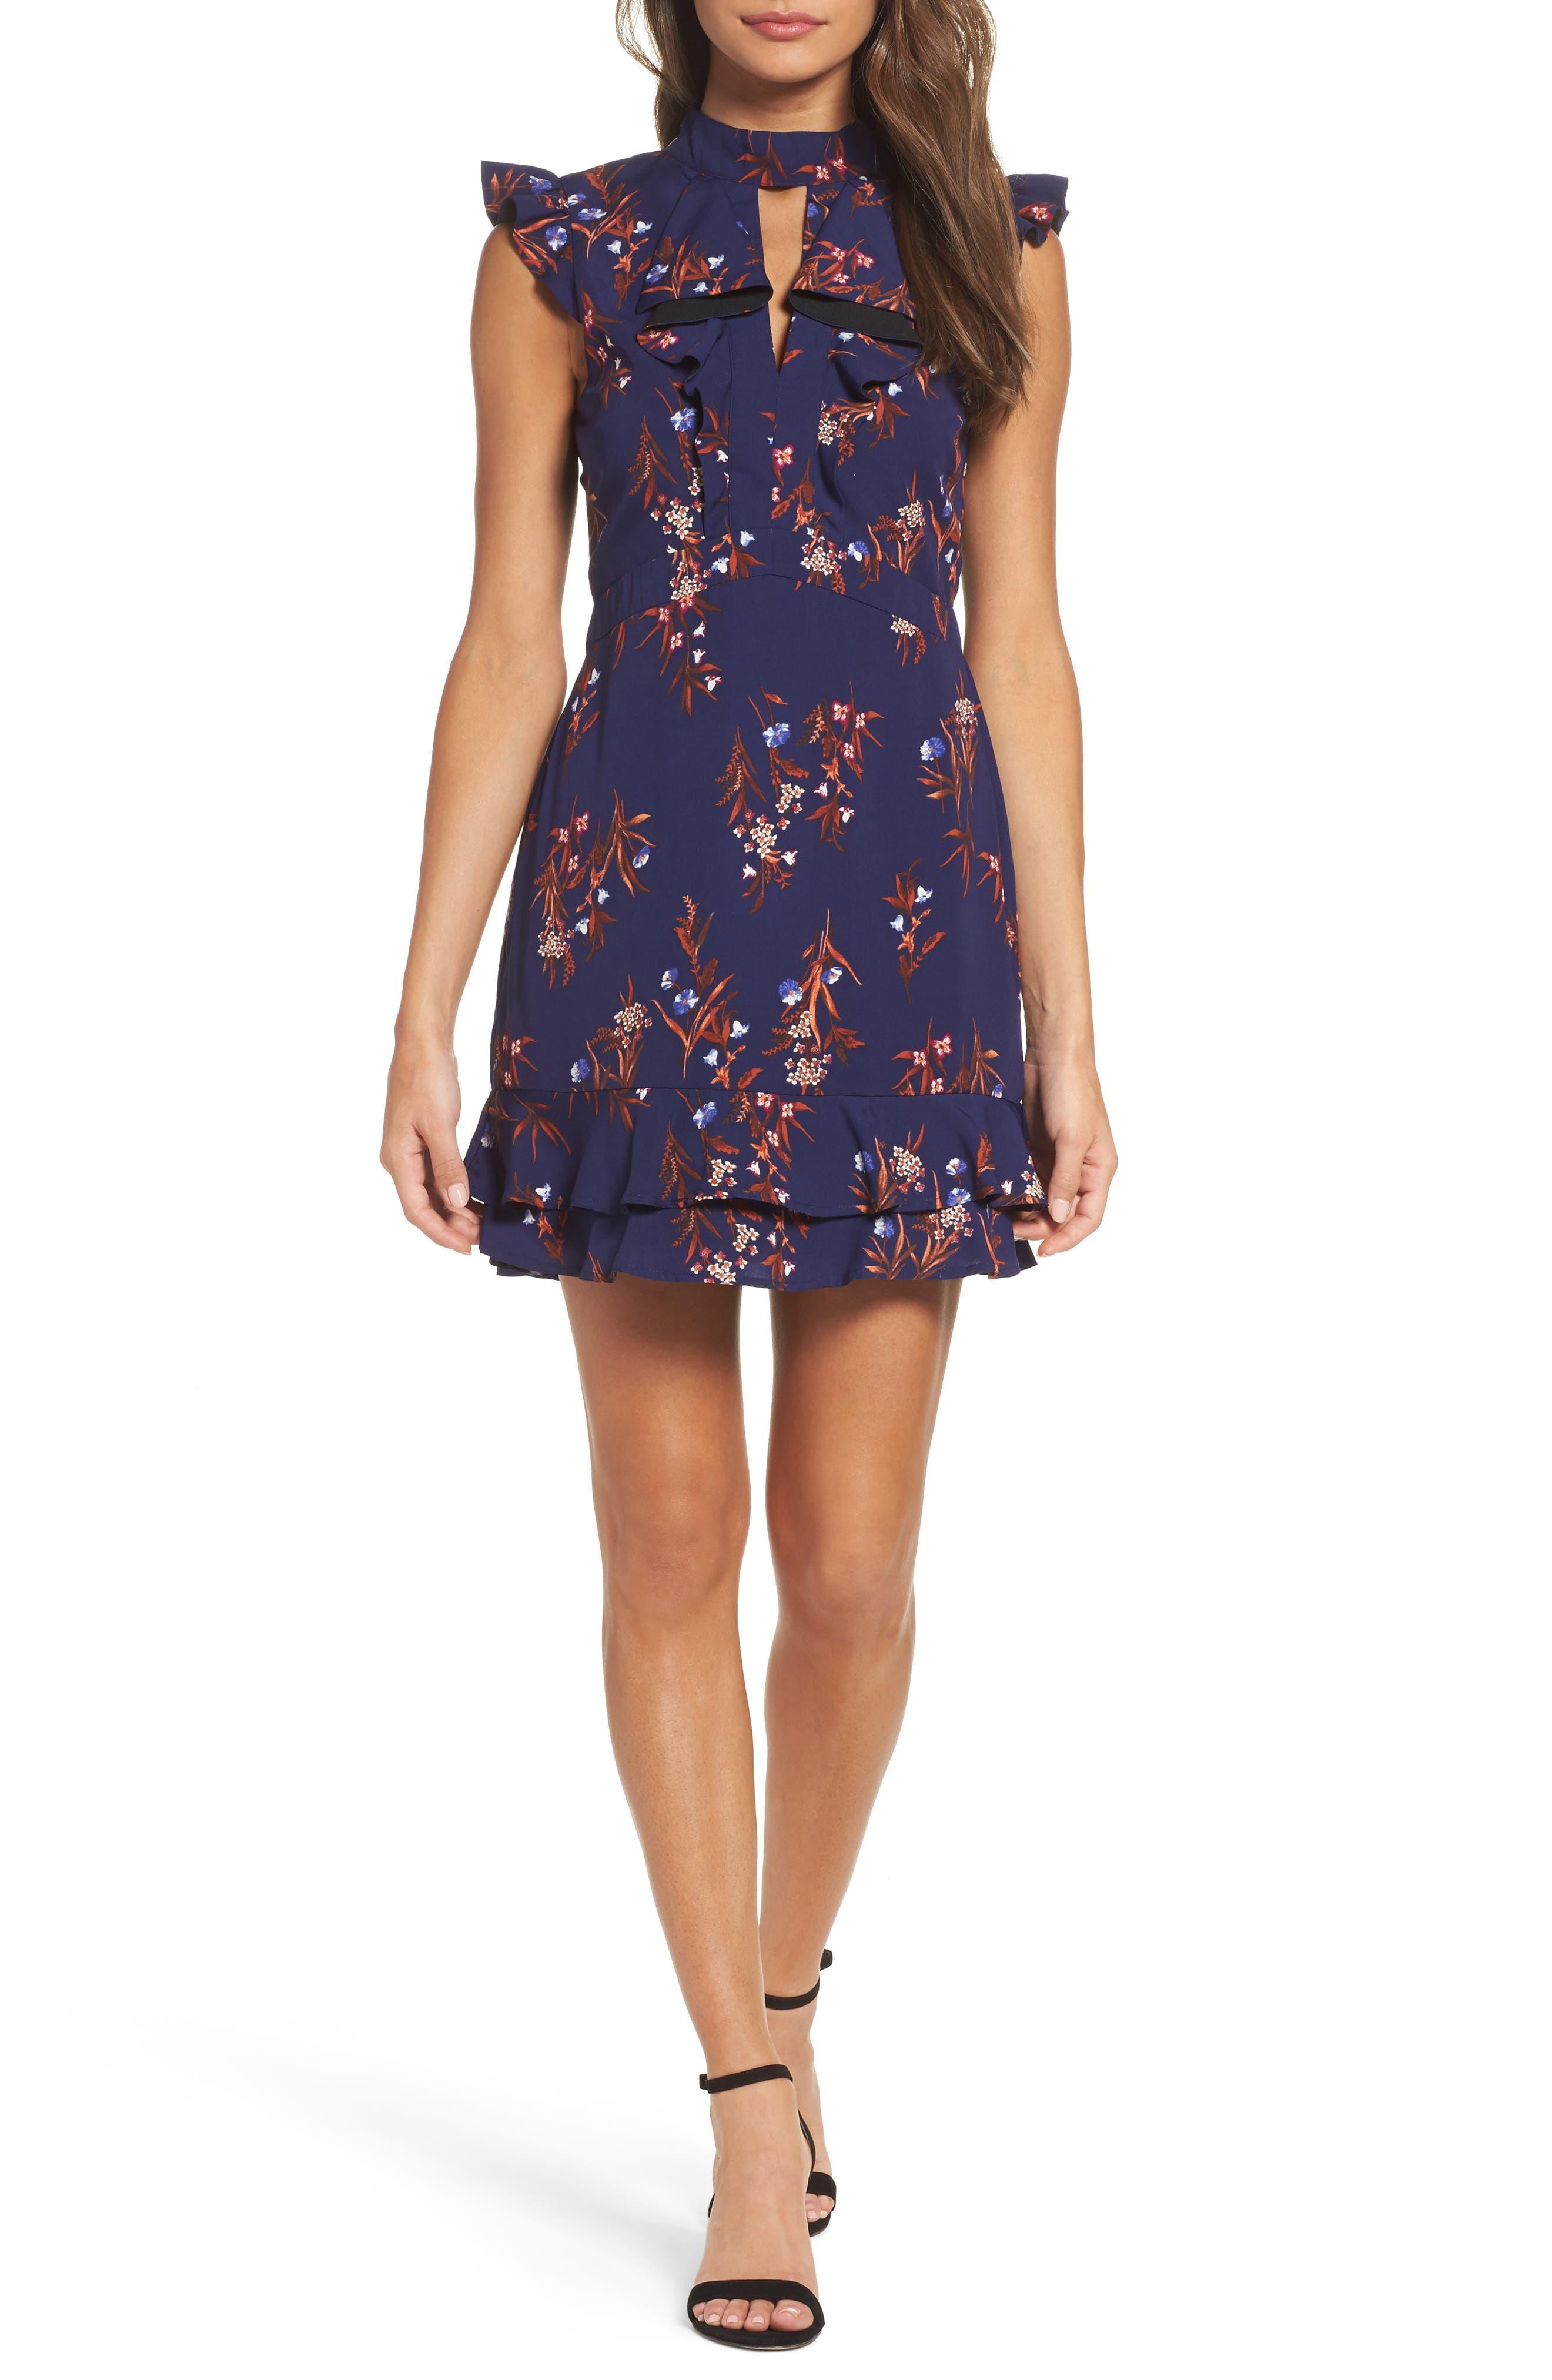 Adelyn Rae Phoebe Ruffle Fit & Flare Dress